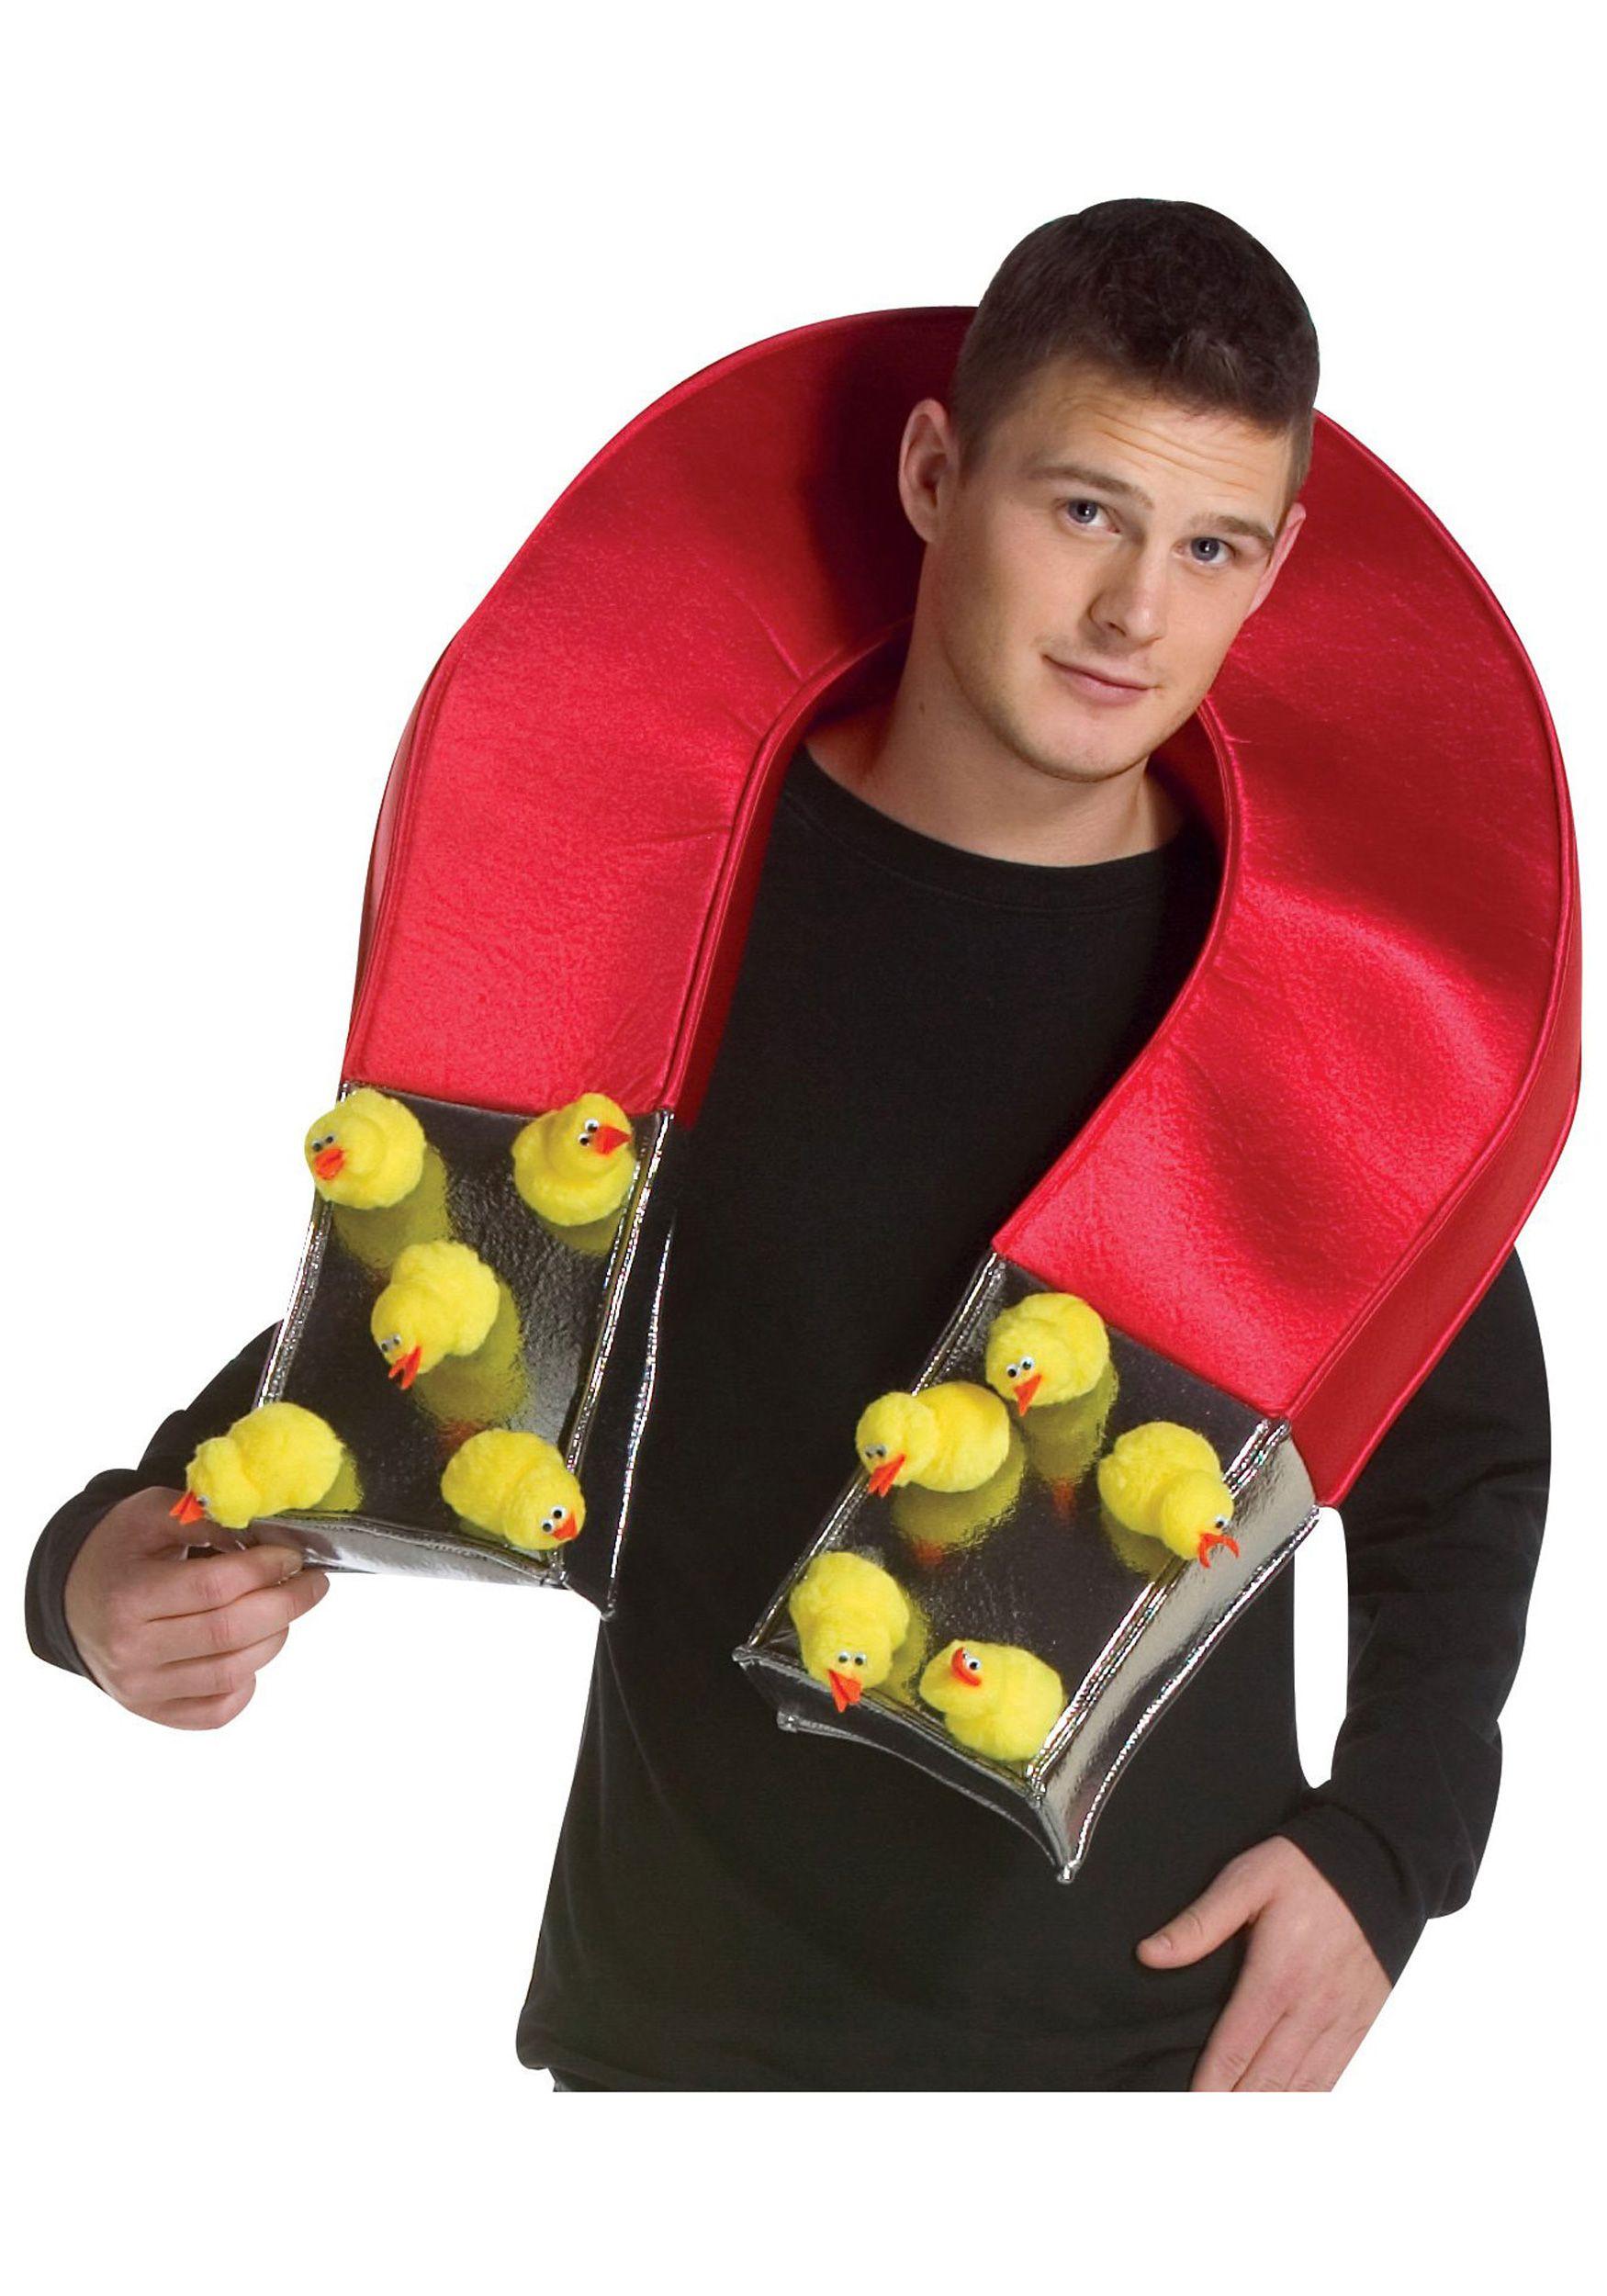 costume ideas for men  d1c3480b9